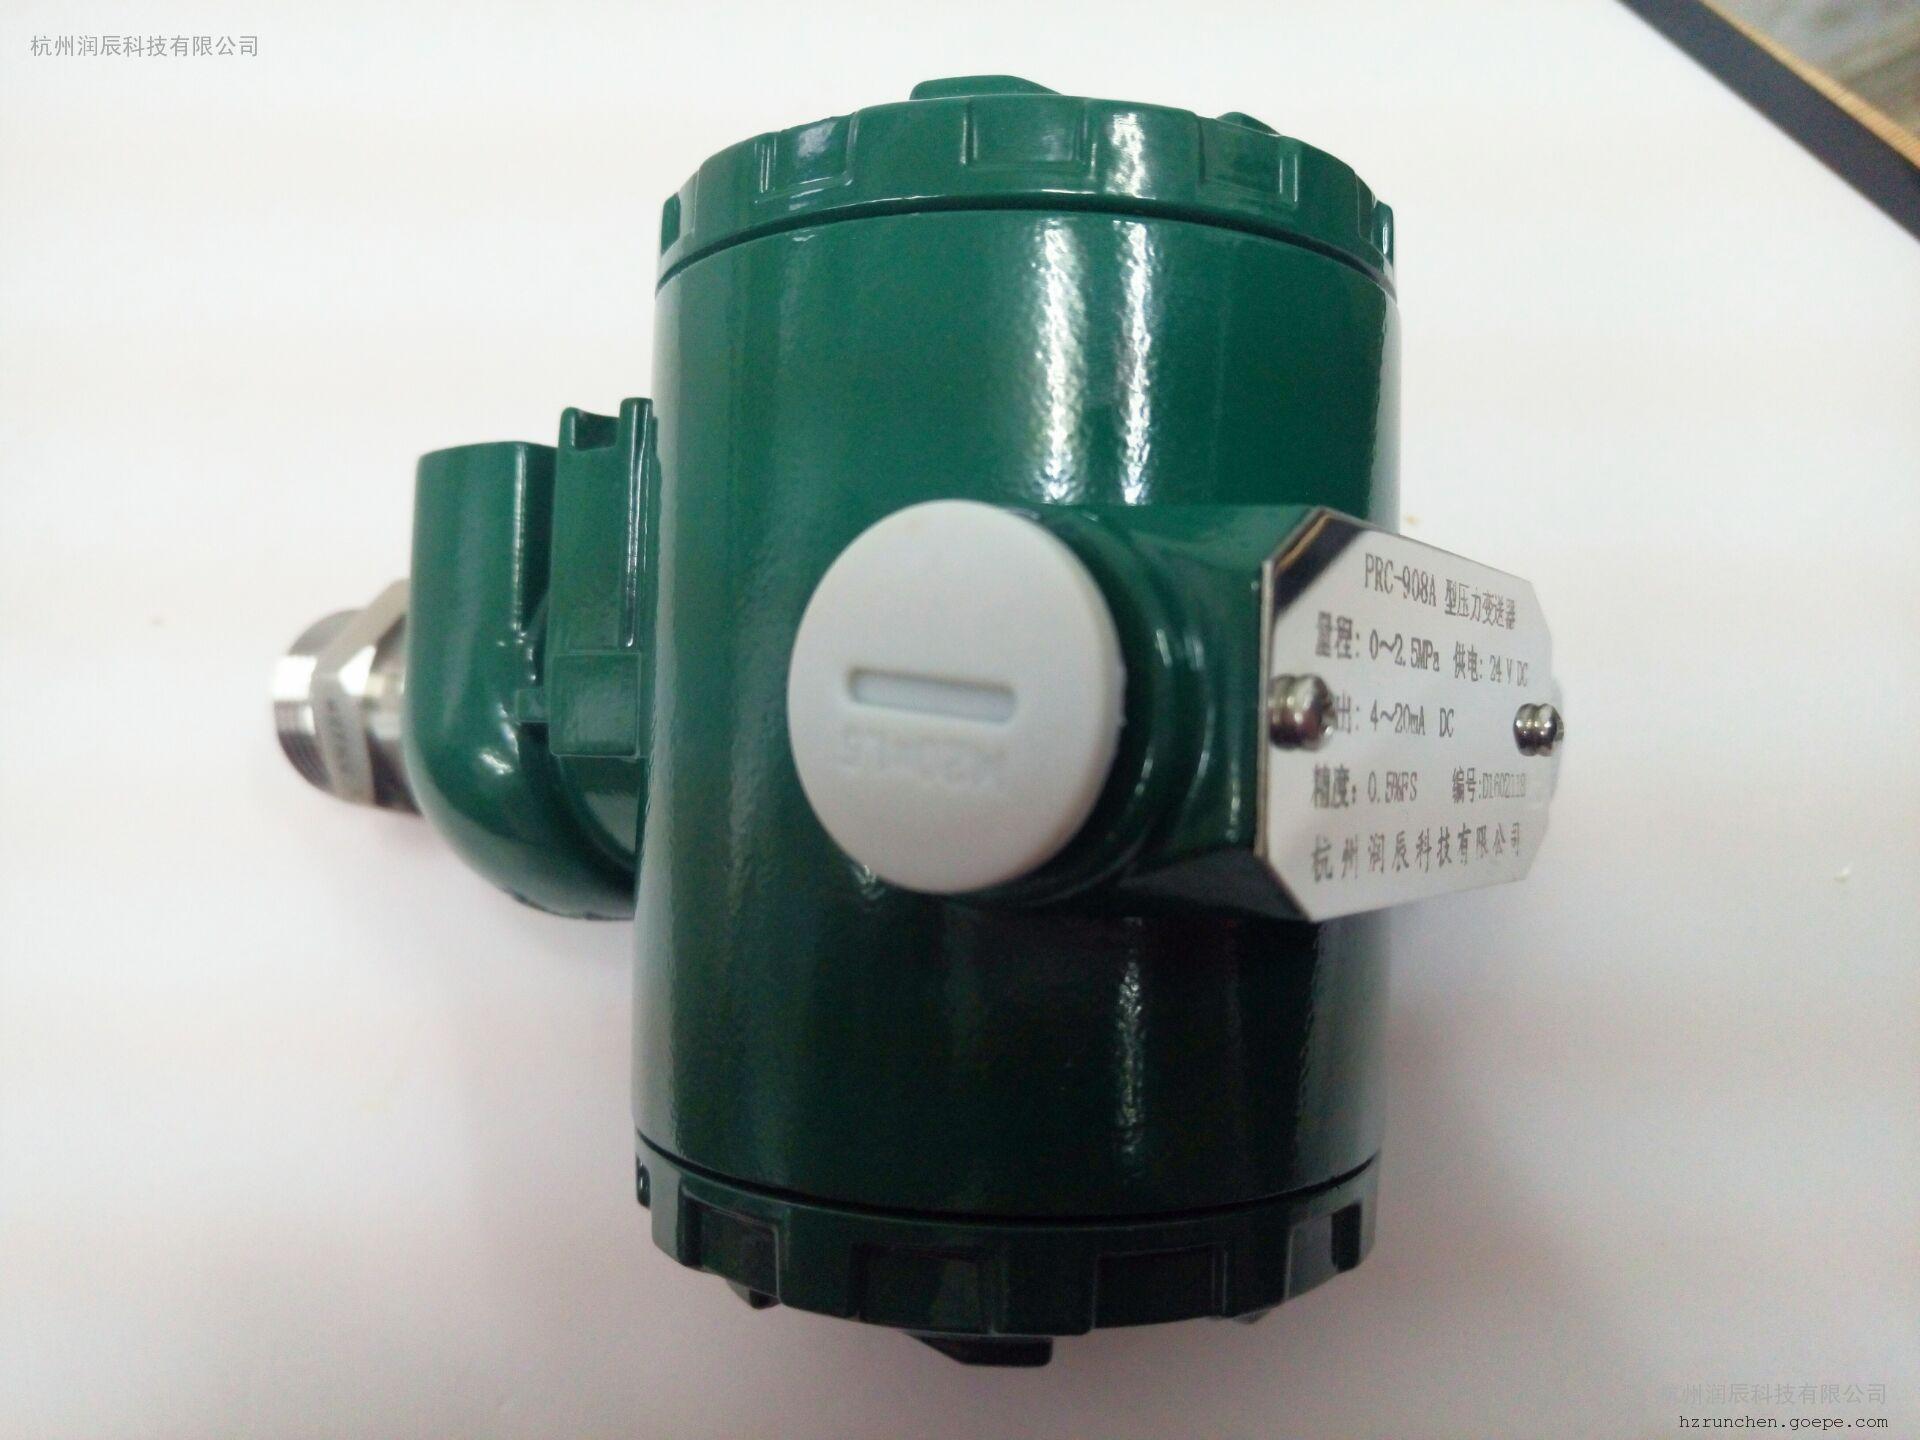 PRC-908A卫生型压力变送器